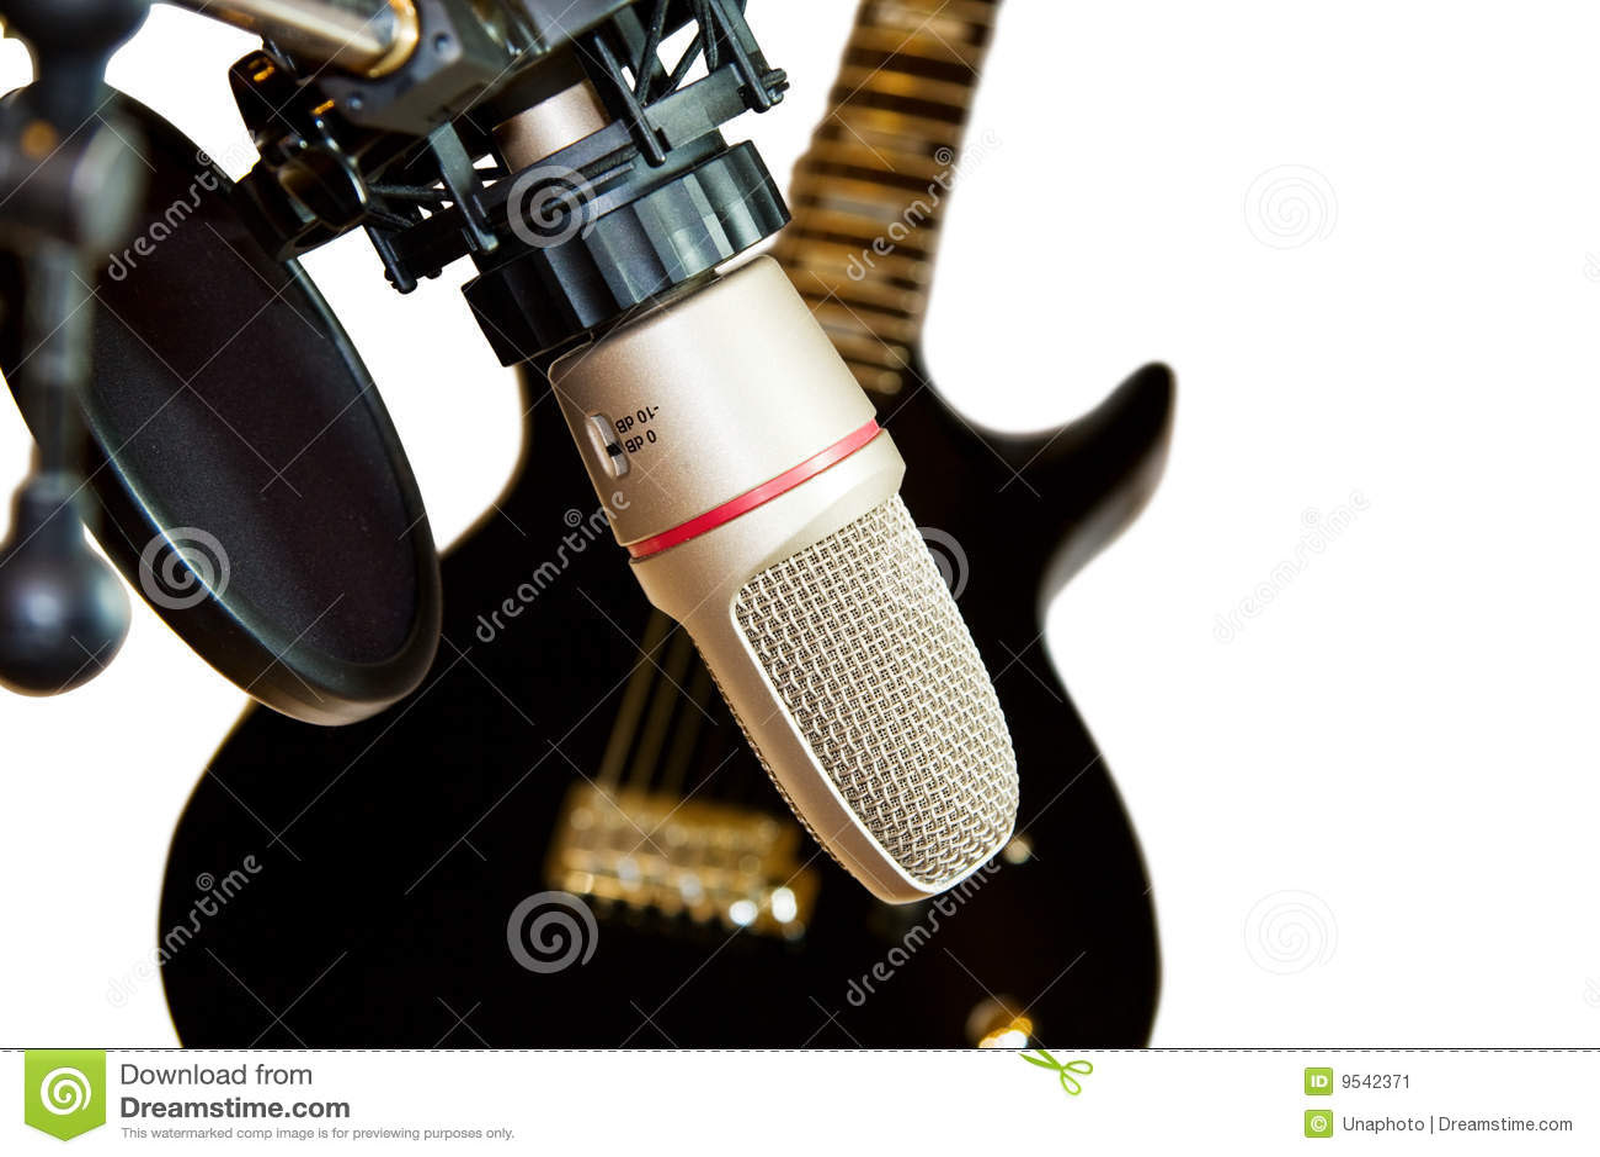 Black and White Recording Studio